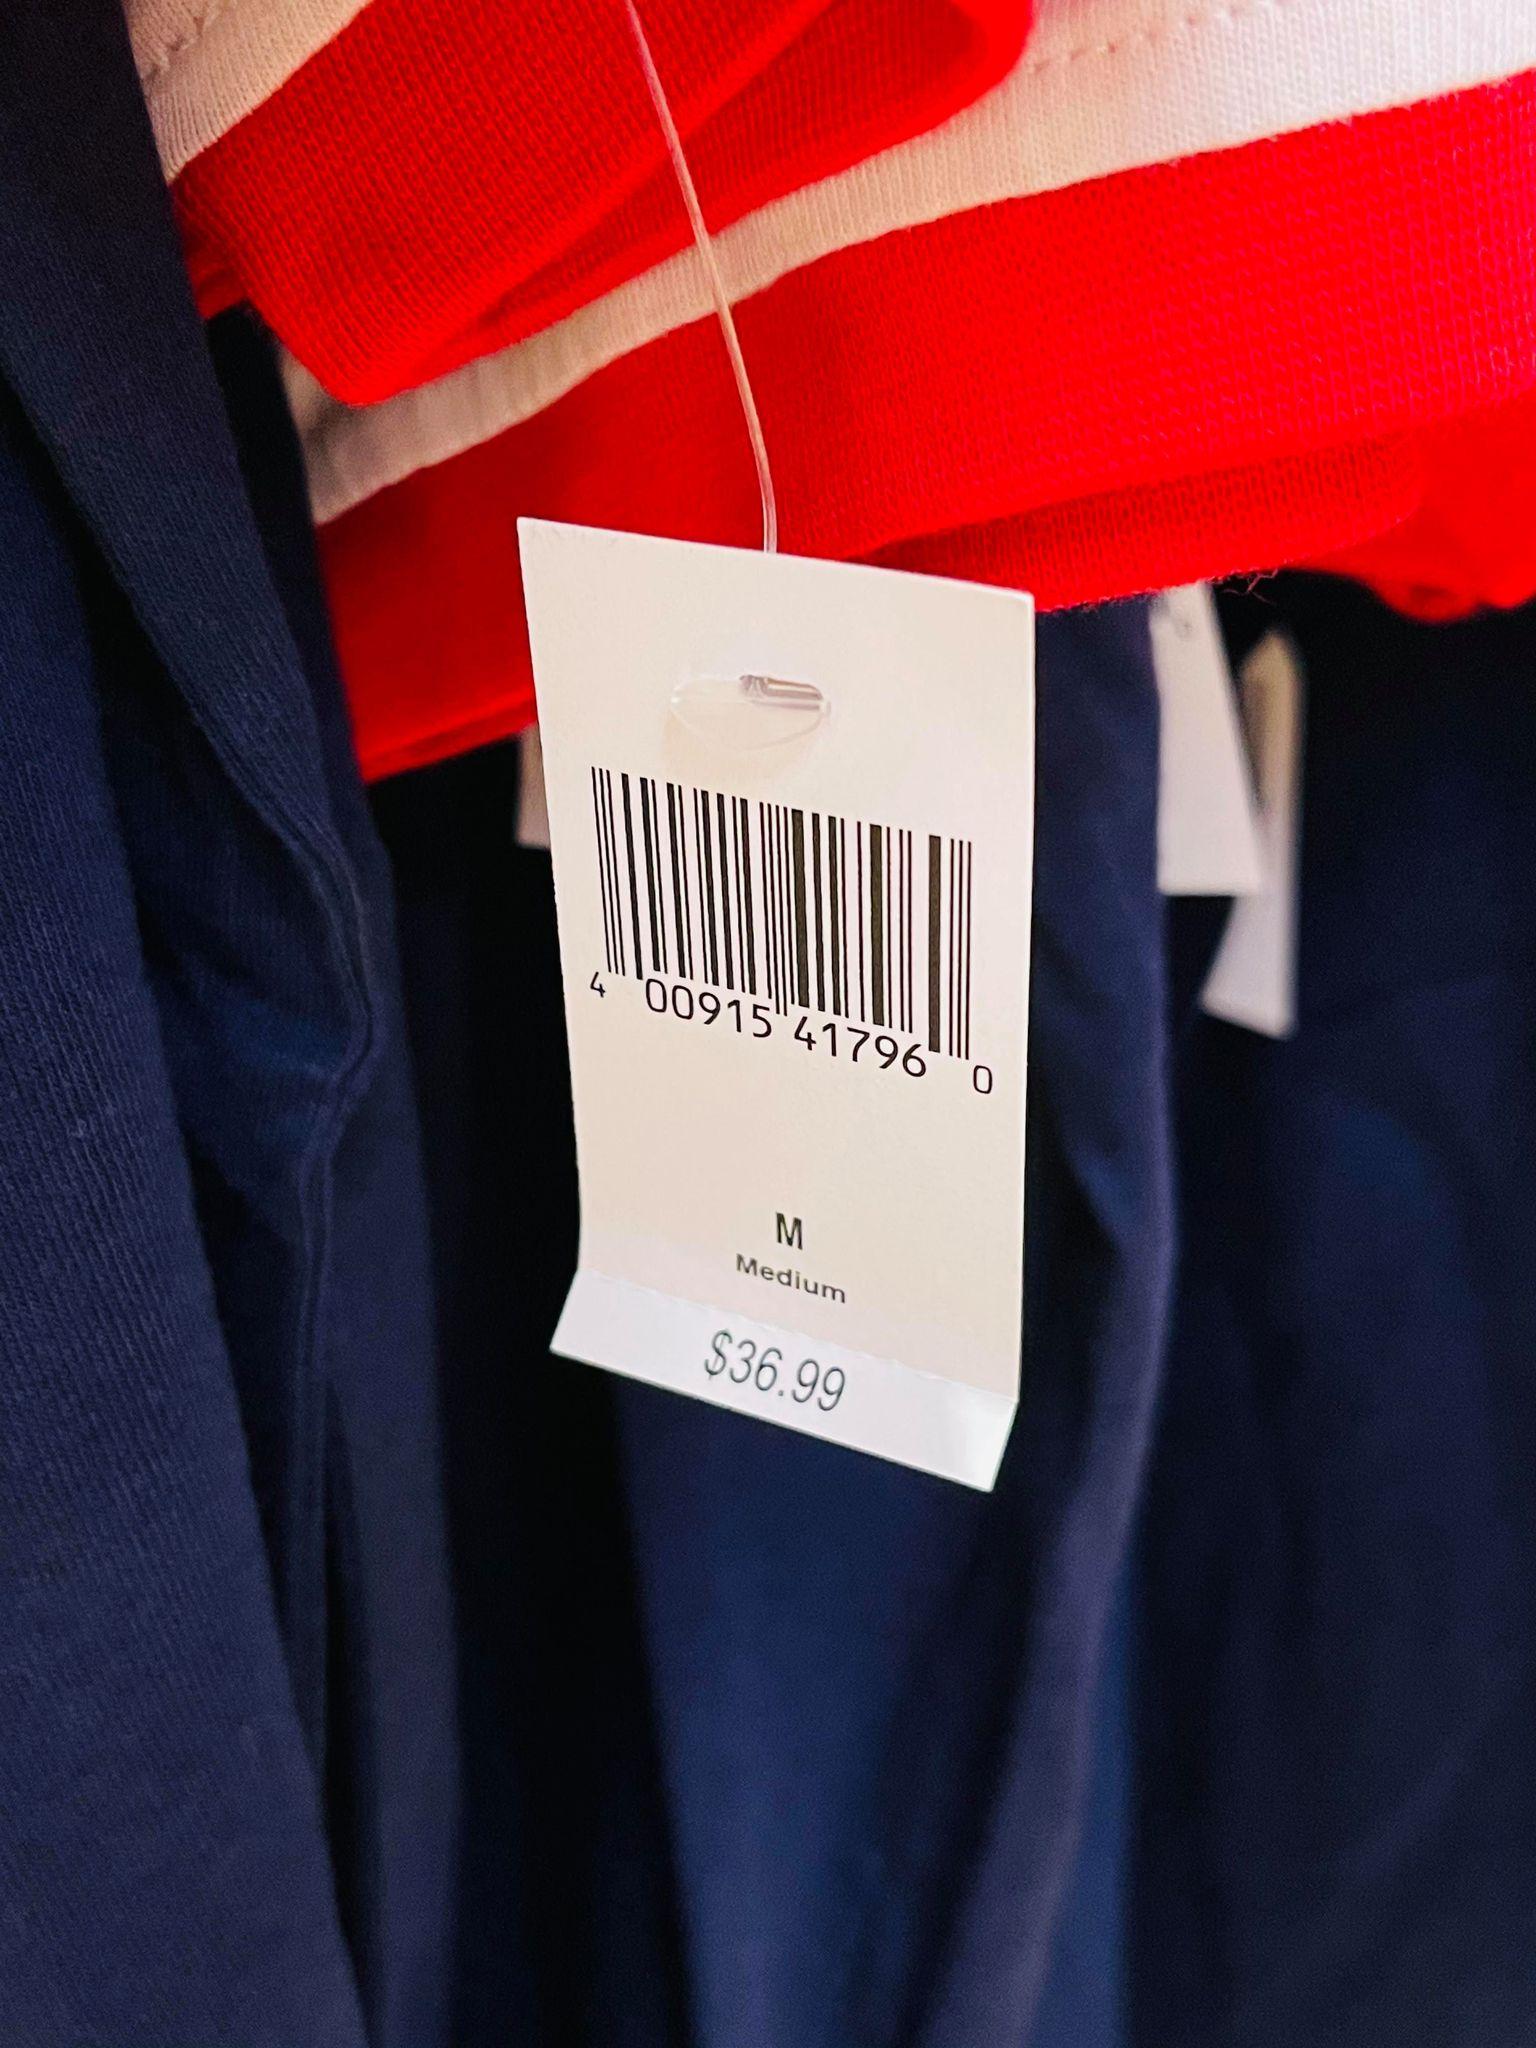 Red White Blue Shirt Price